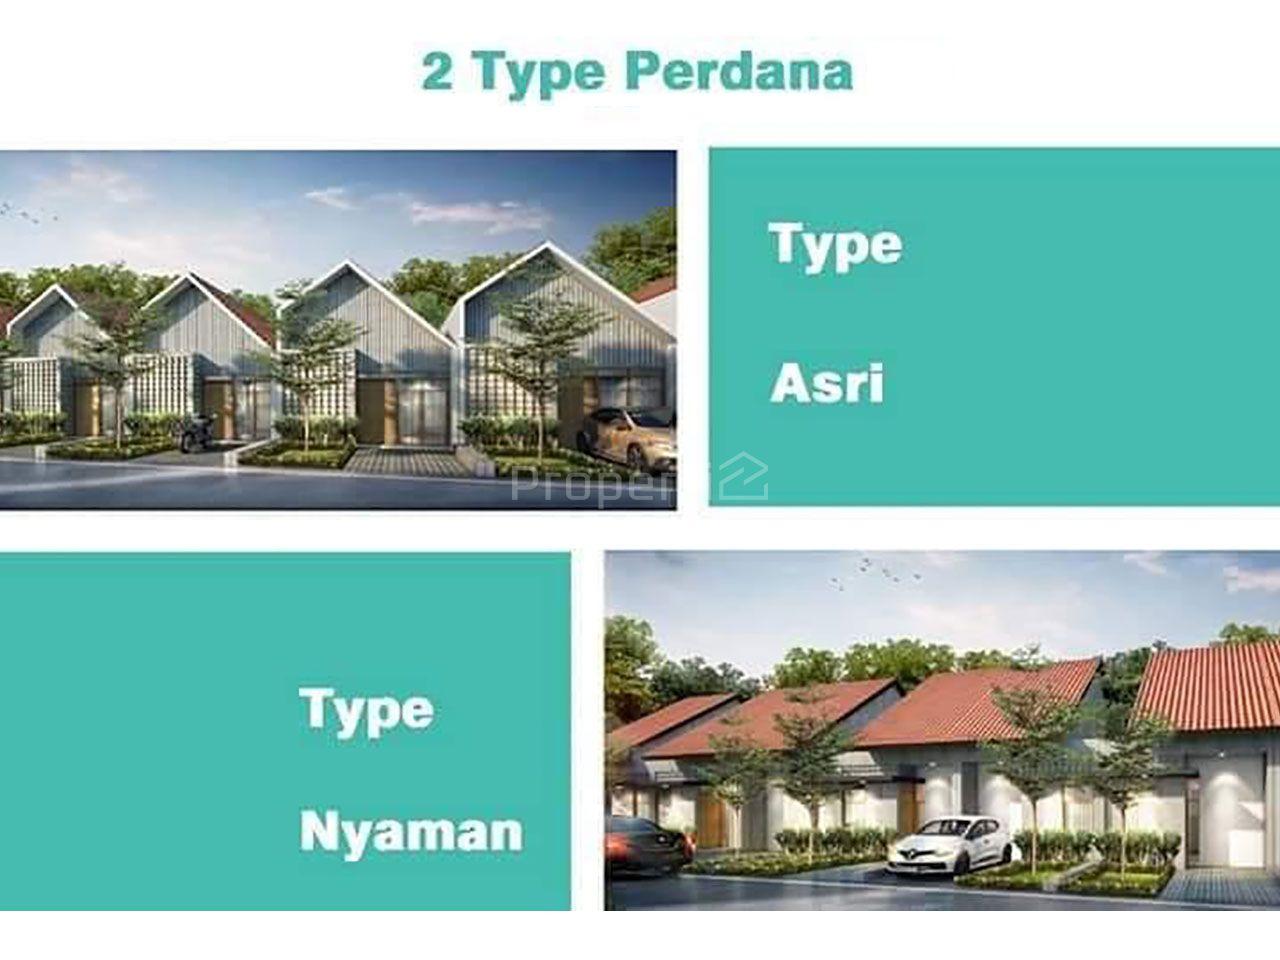 Perumahan The Essentials, Jambe, Tangerang, Banten